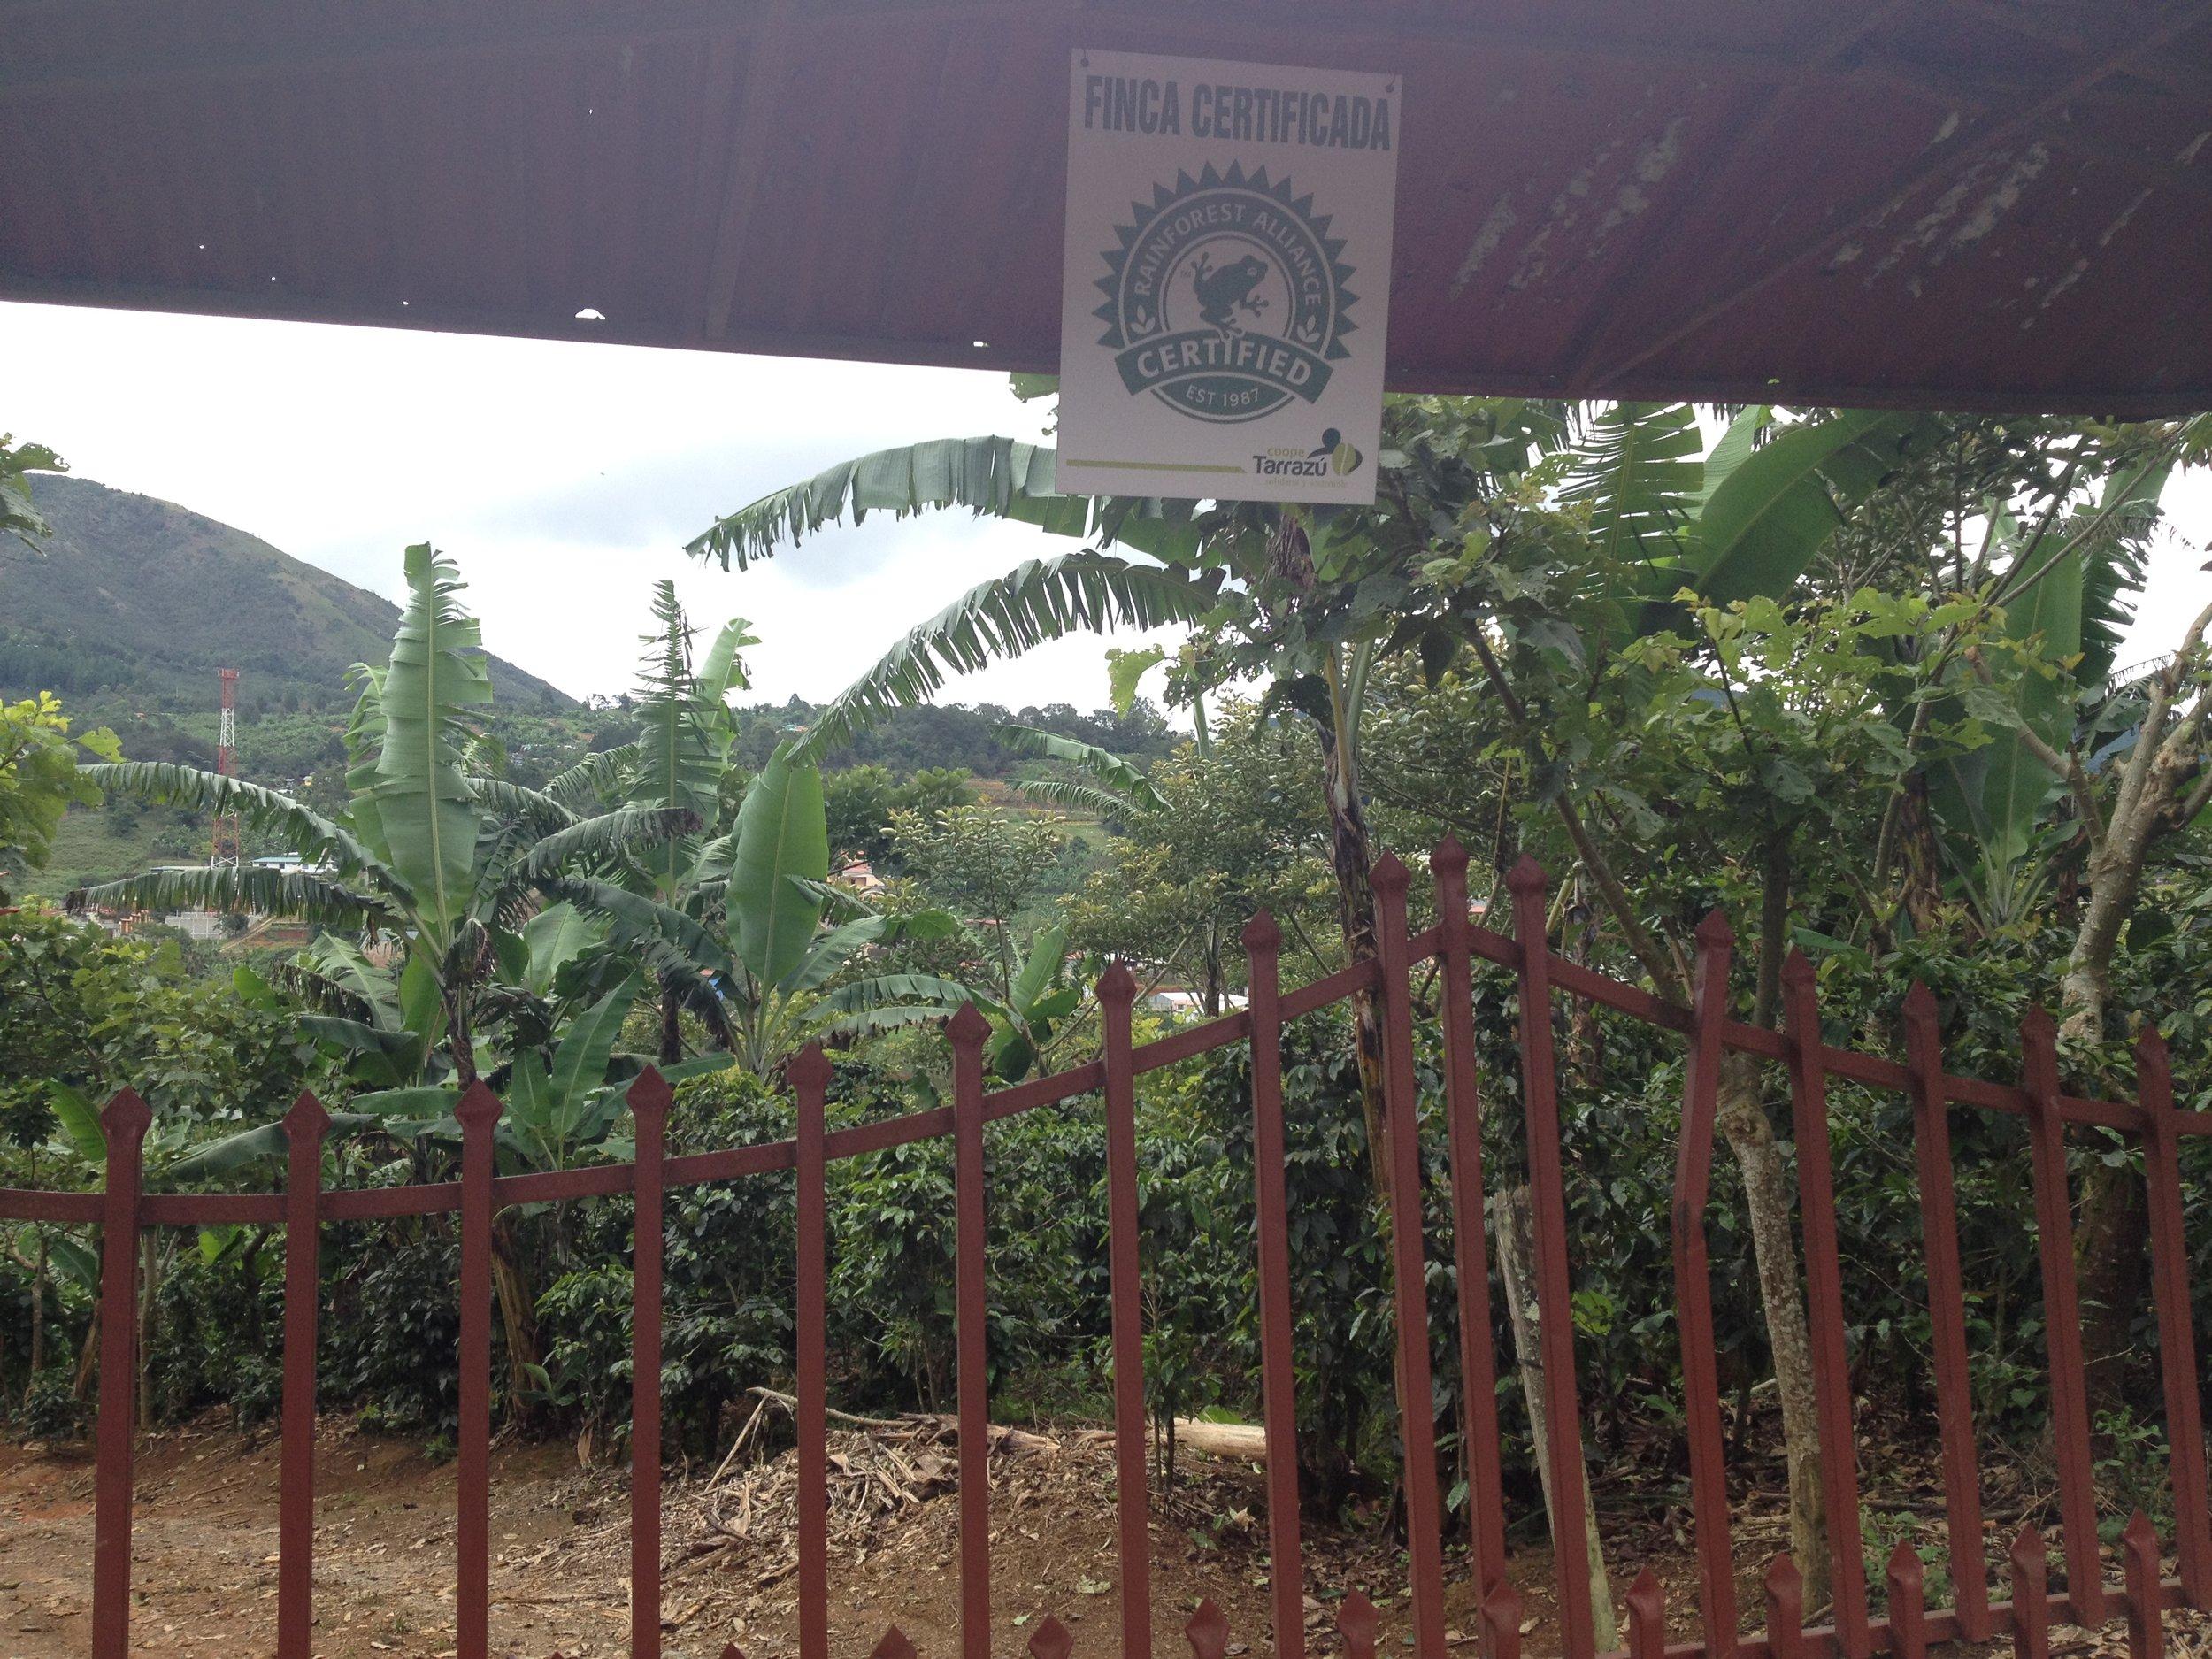 Rainforest Alliance farm